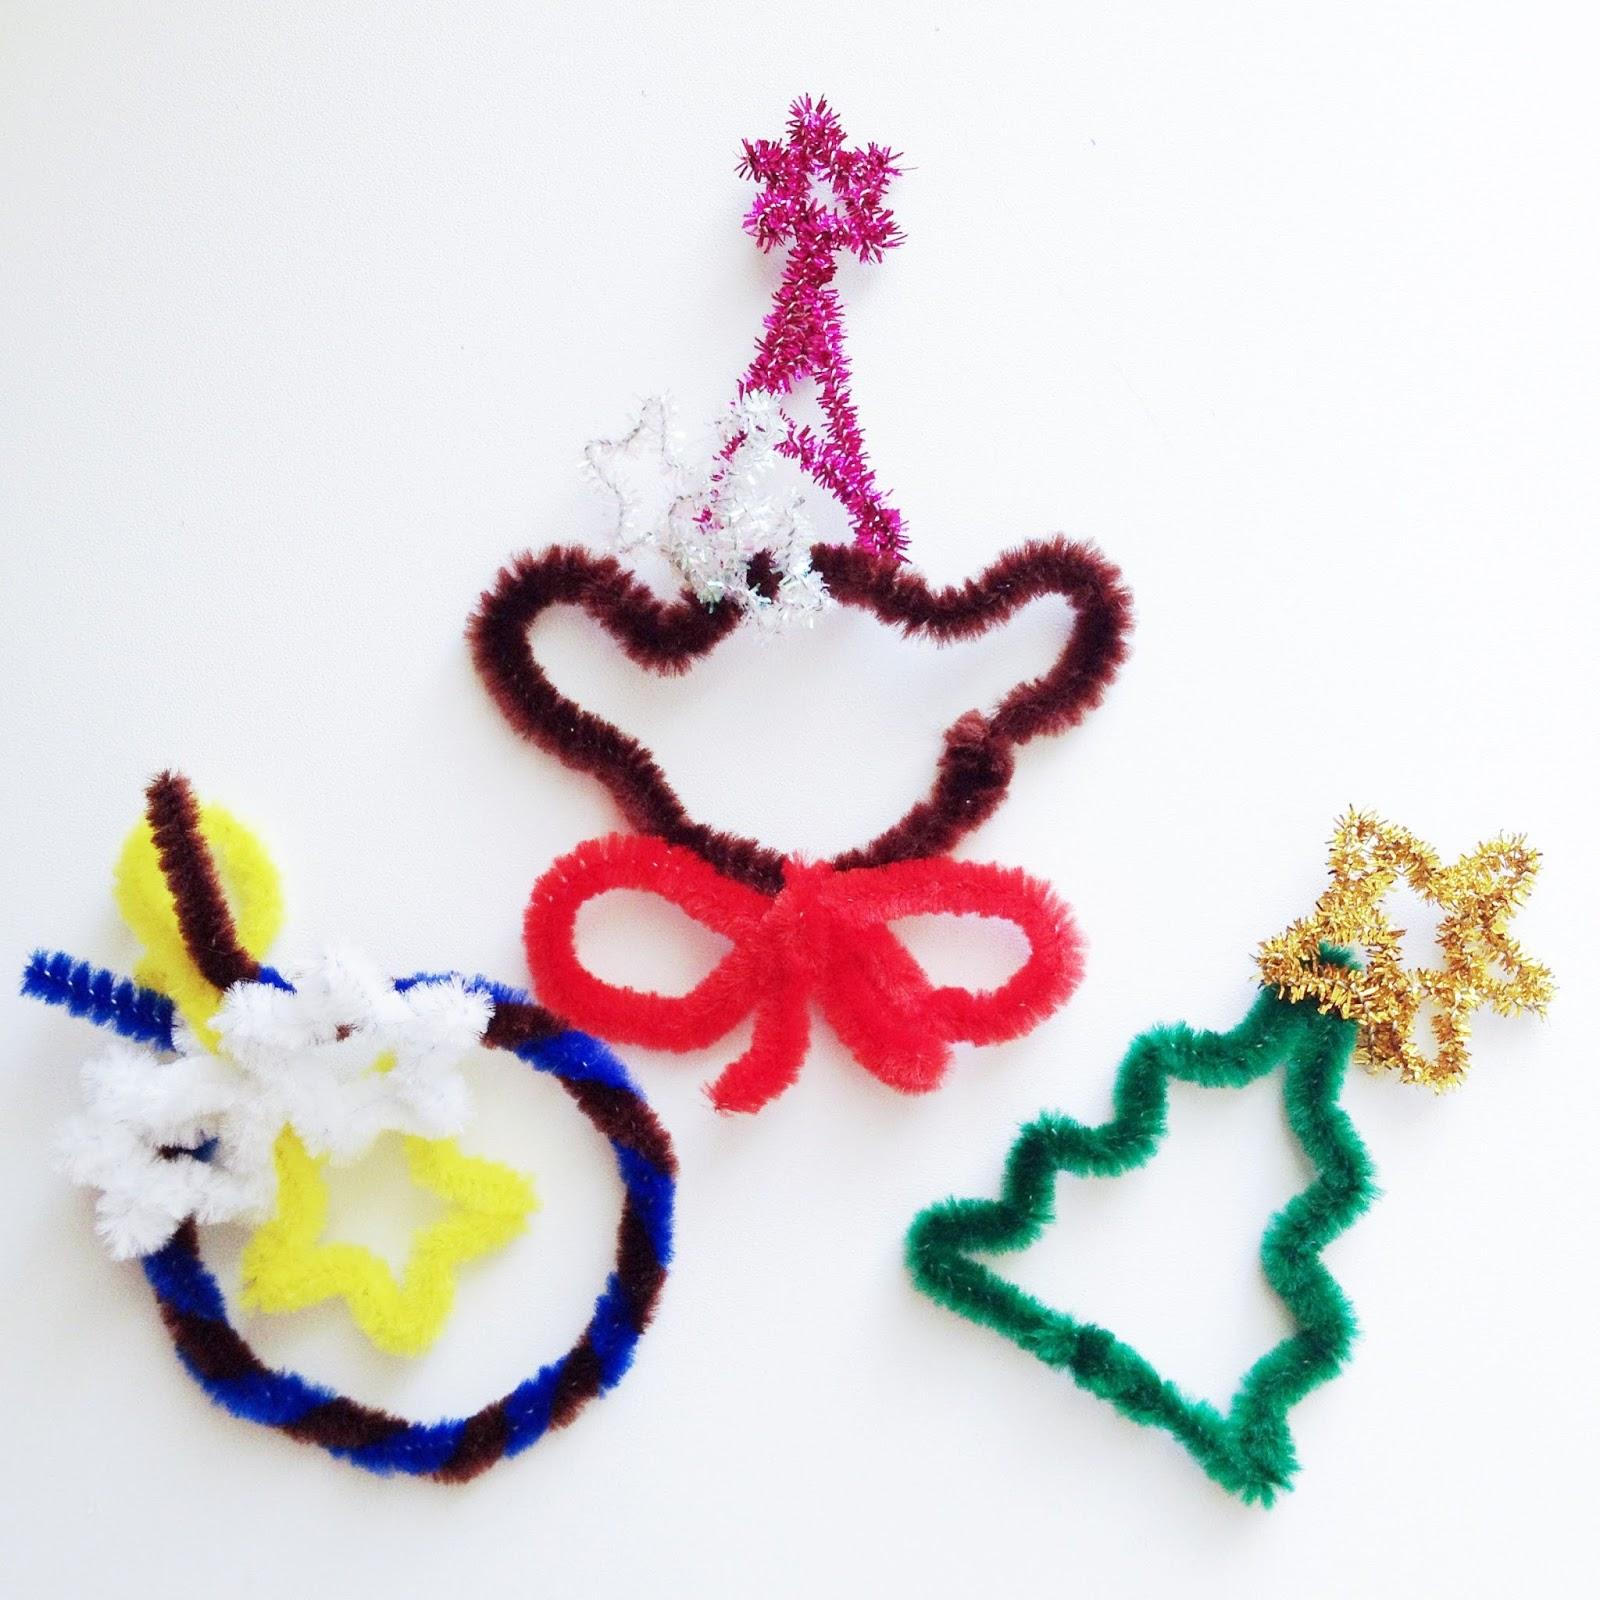 yukamila art: Pipe Cleaner Crafts: Christmas Ornaments 2013